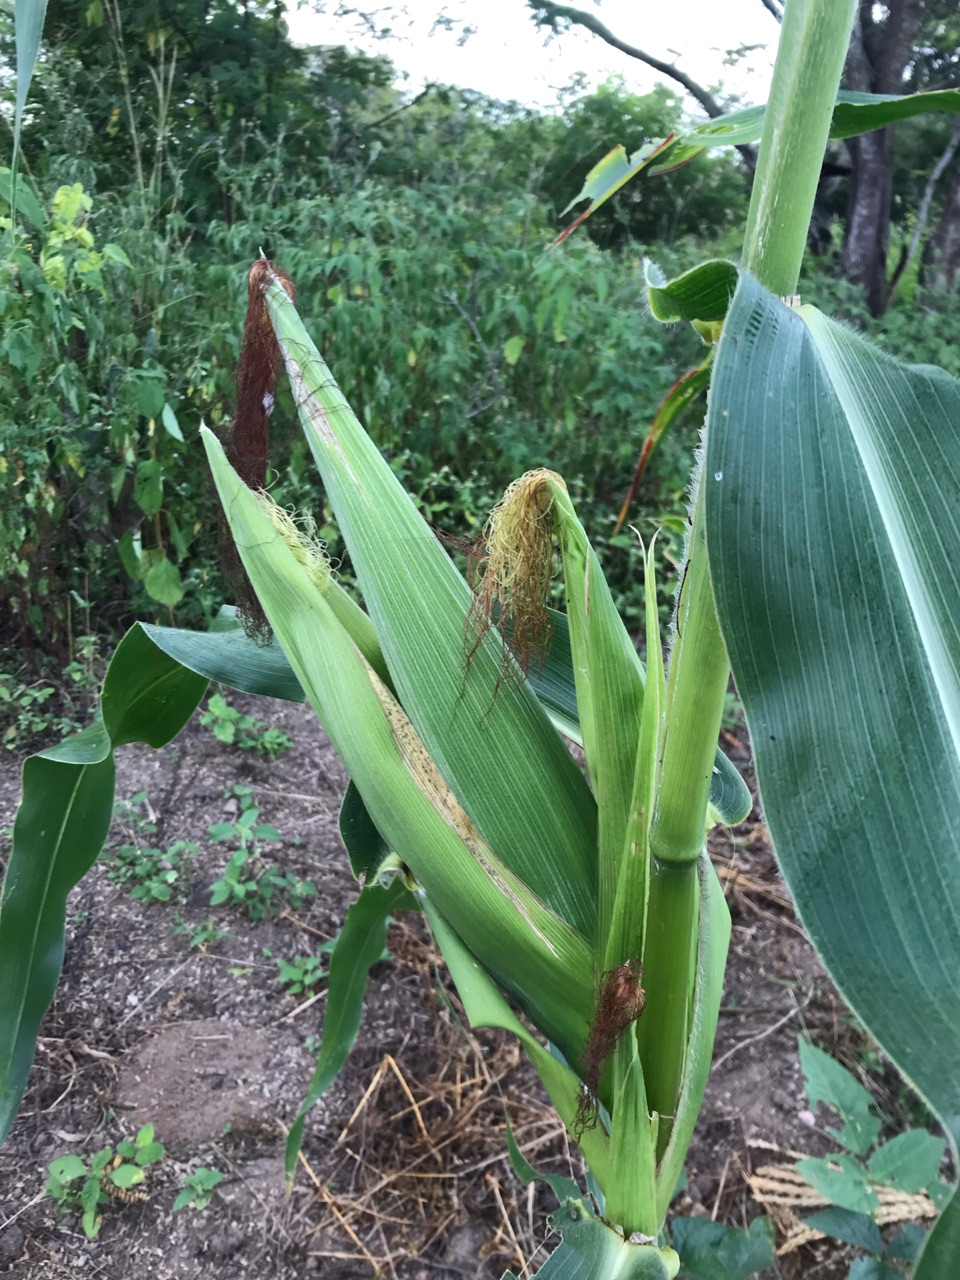 autoral, nature, and corn image